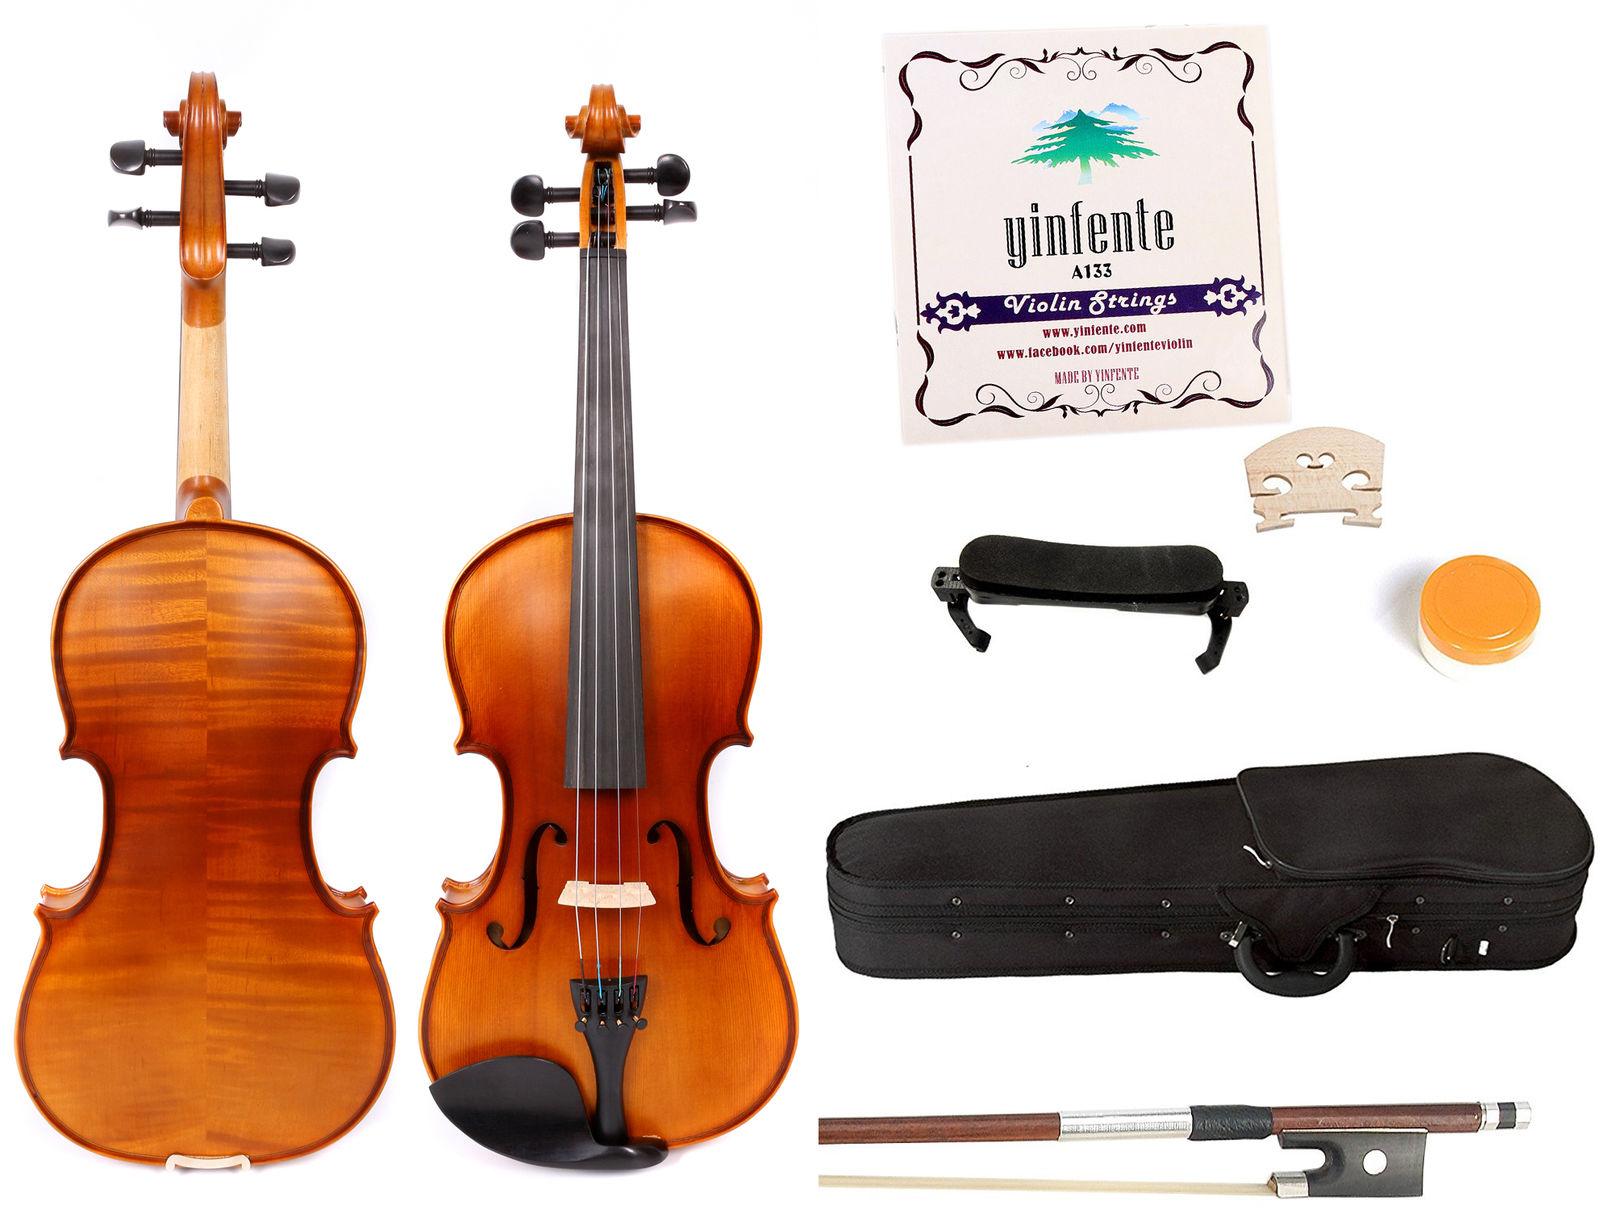 Sports & Entertainment Violin Parts & Accessories Violin Head Maple Neck Hand Carved Maple Wood Violin Ebony Fingerboard